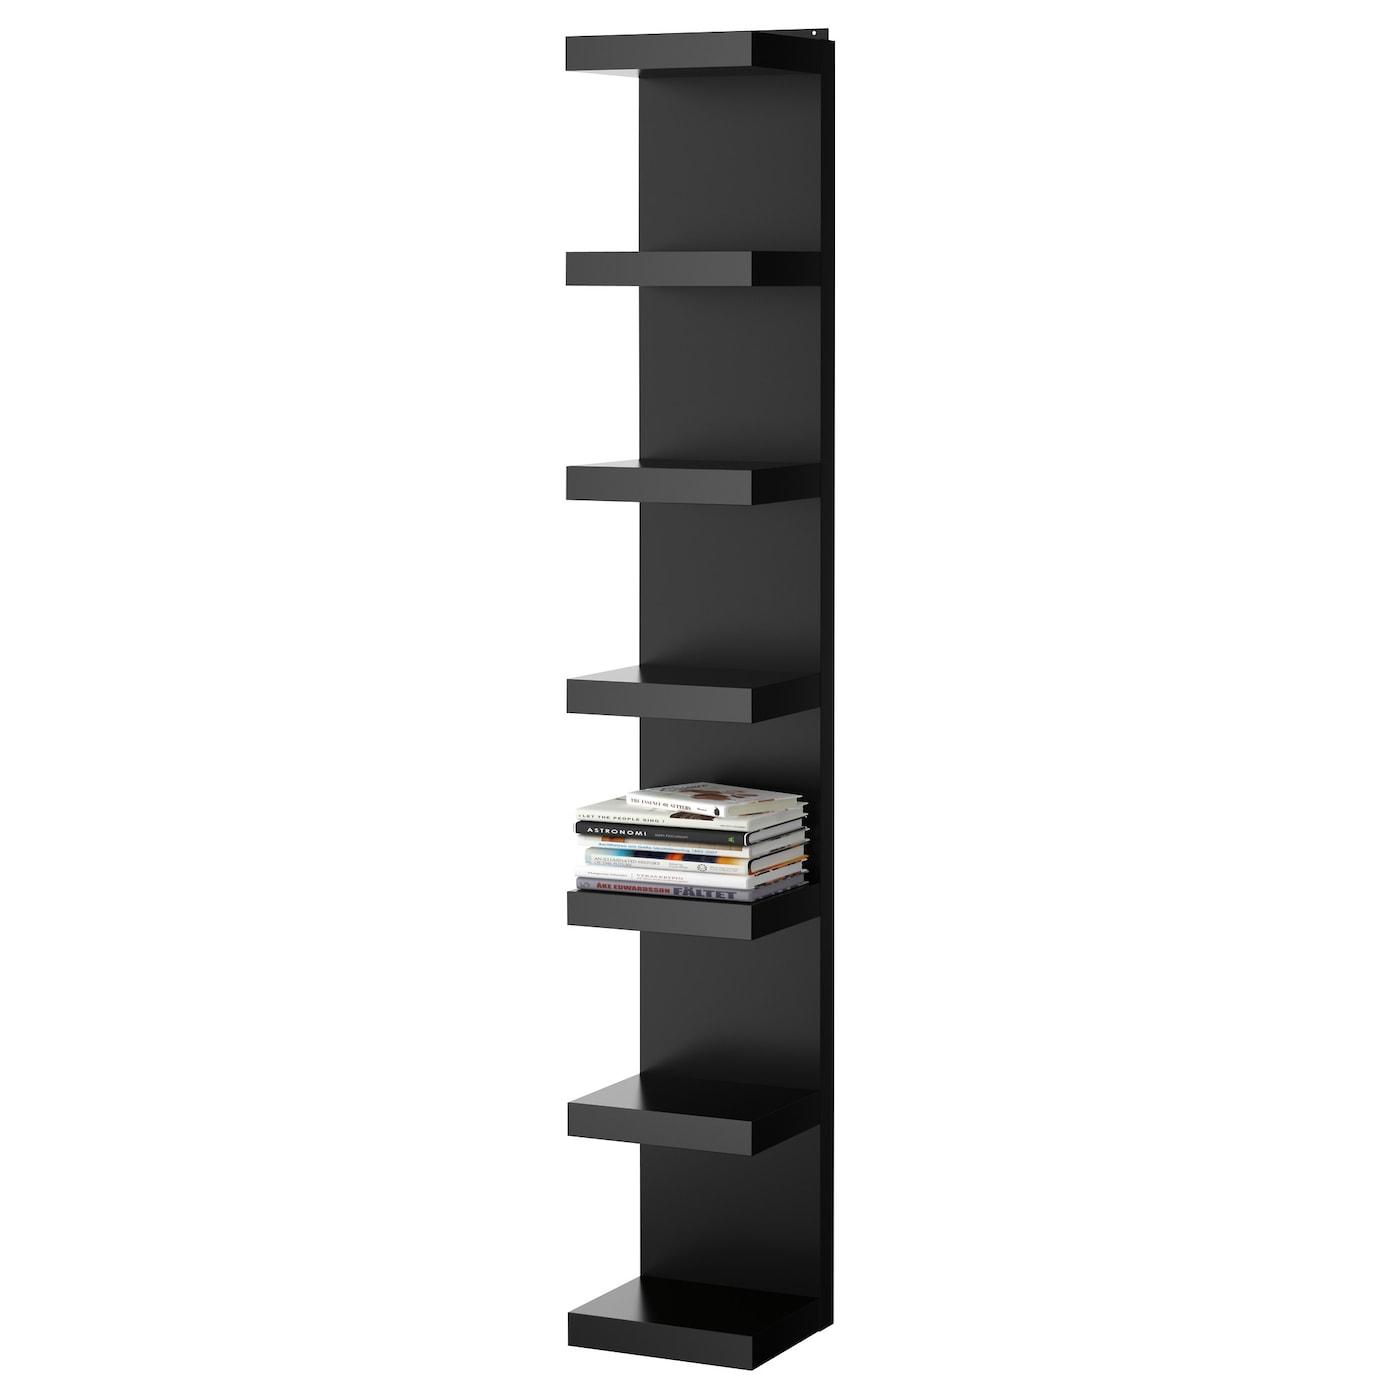 LACK Wall Shelf Unit Black 30 X 190 Cm